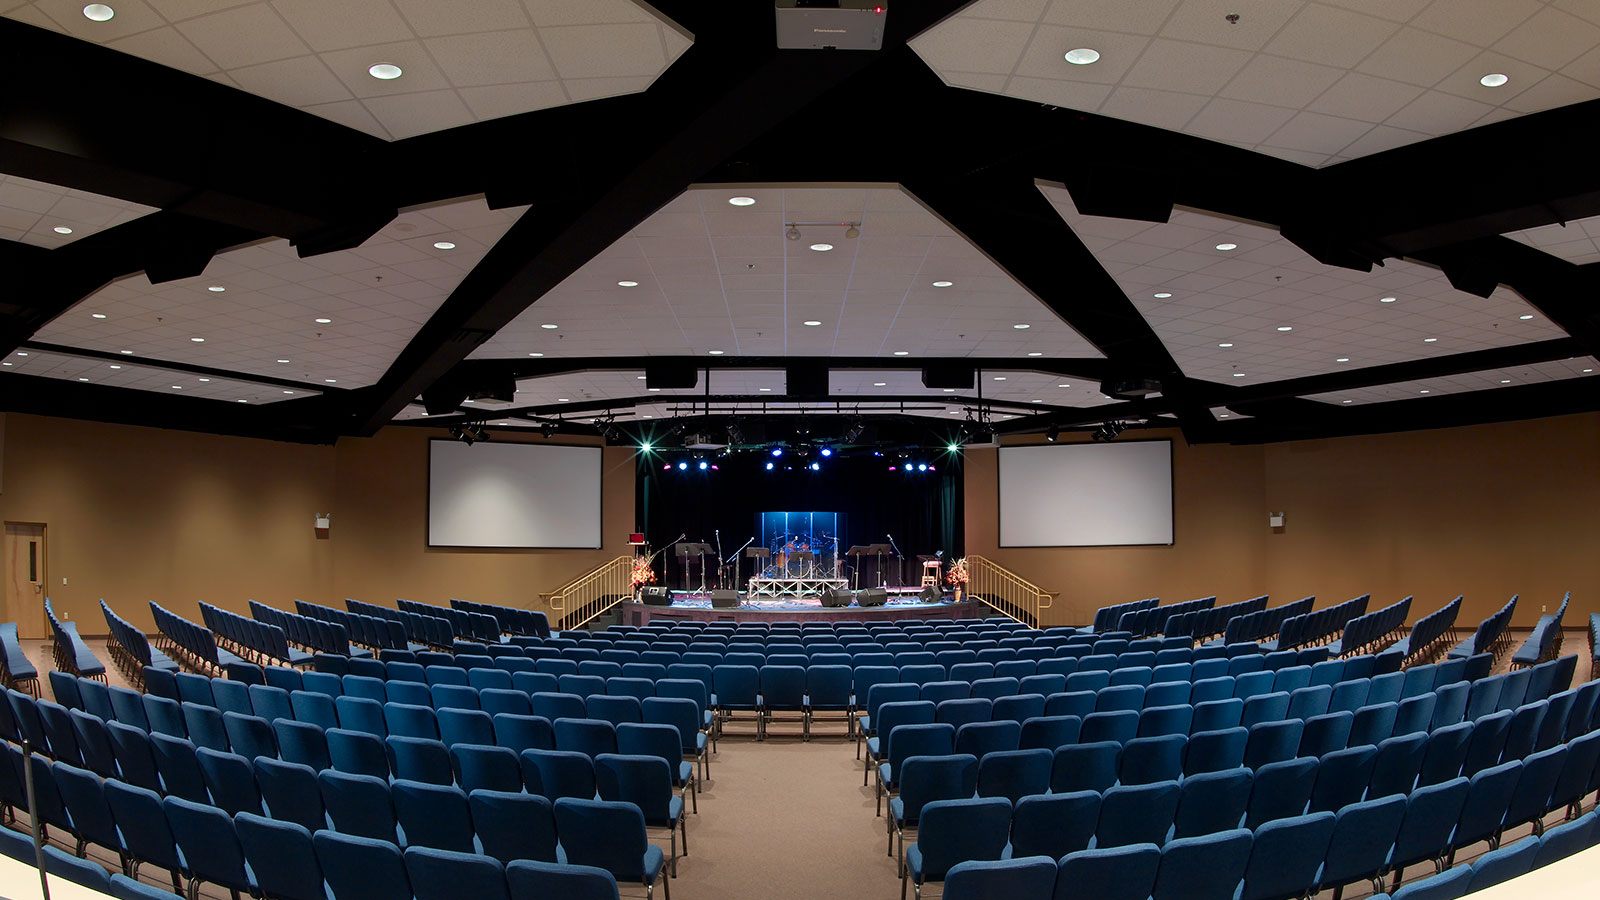 Grace-Fellowship-Church---Phase-1-Auditorium-08.jpg